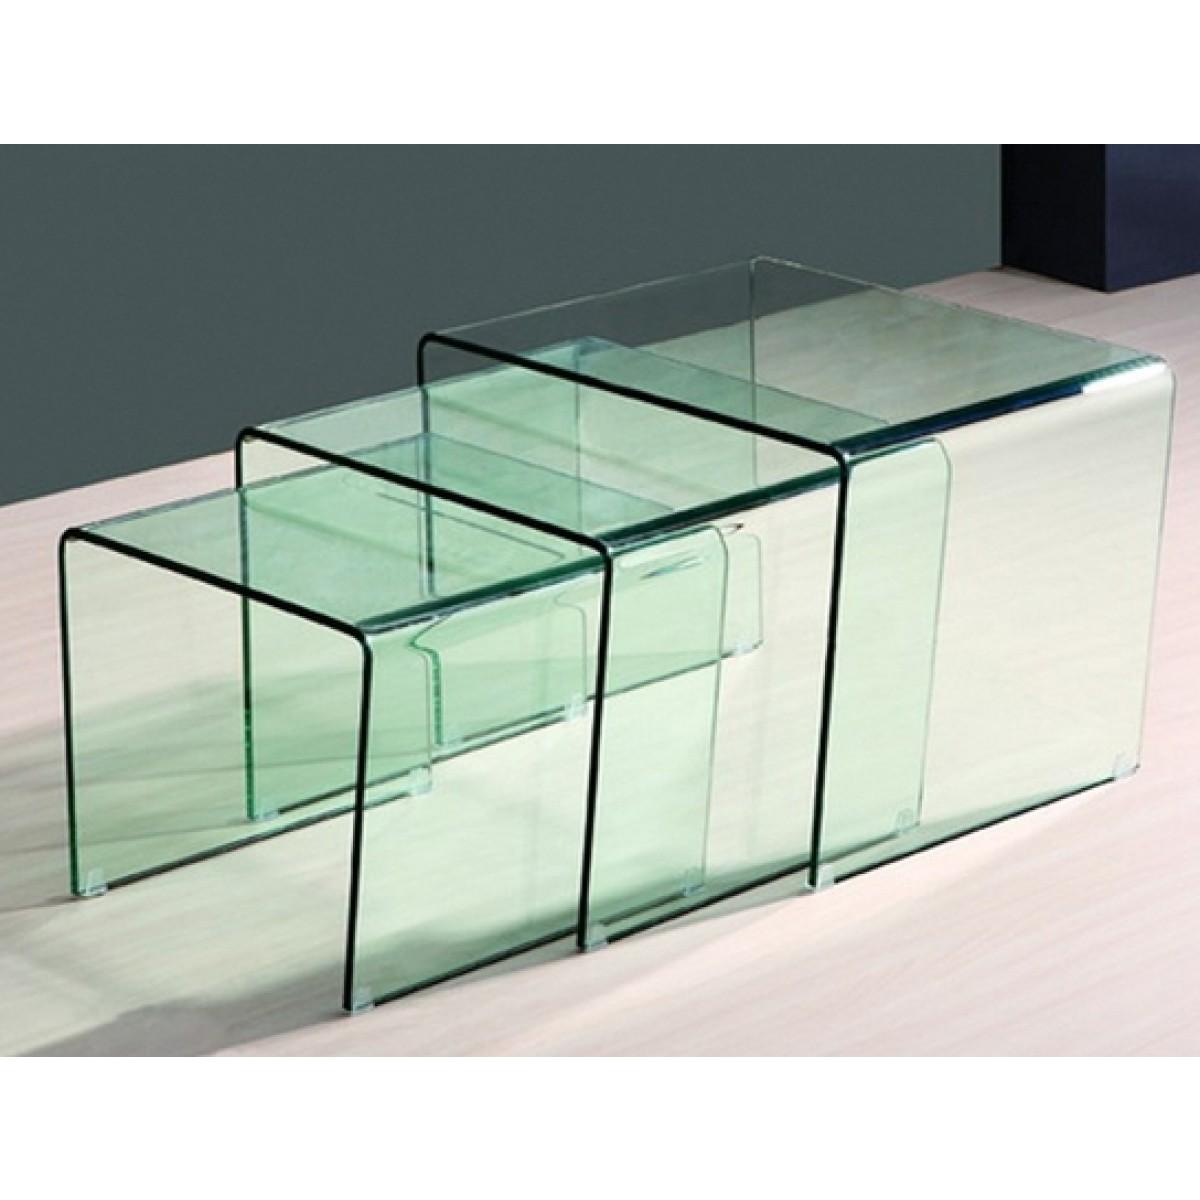 Table basse design gigogne - Table basse gigogne design ...